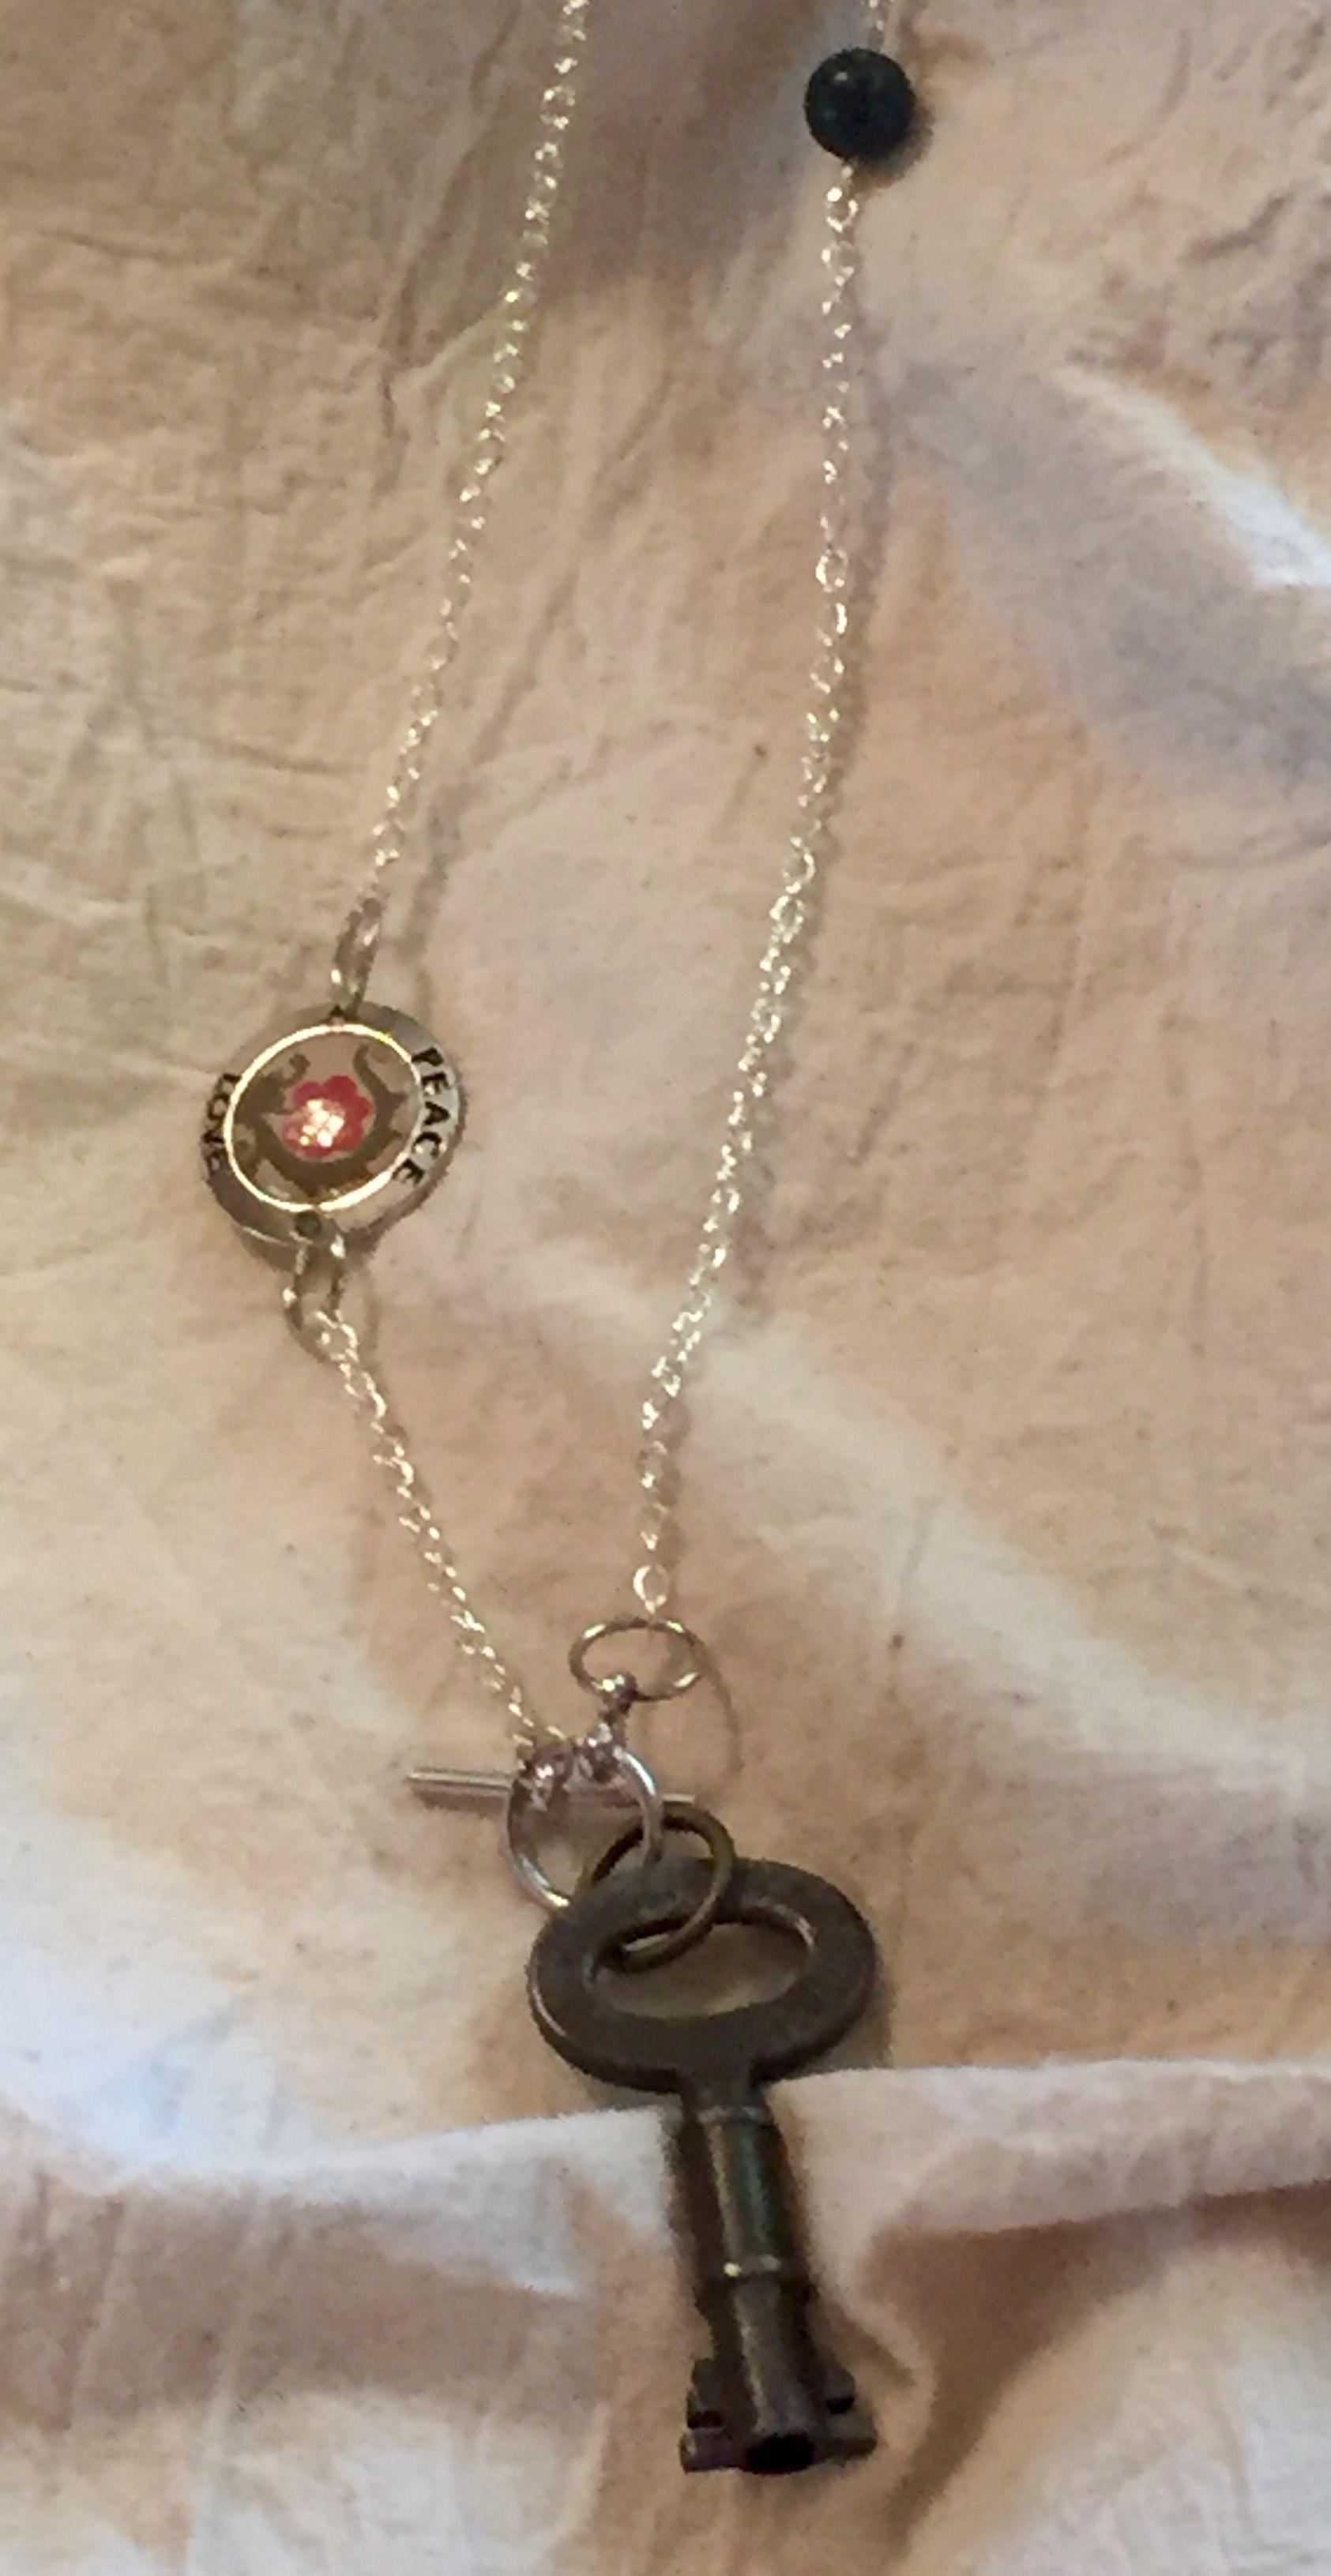 Pin by Dolores Hogan on Vintage key jewelry Key jewelry